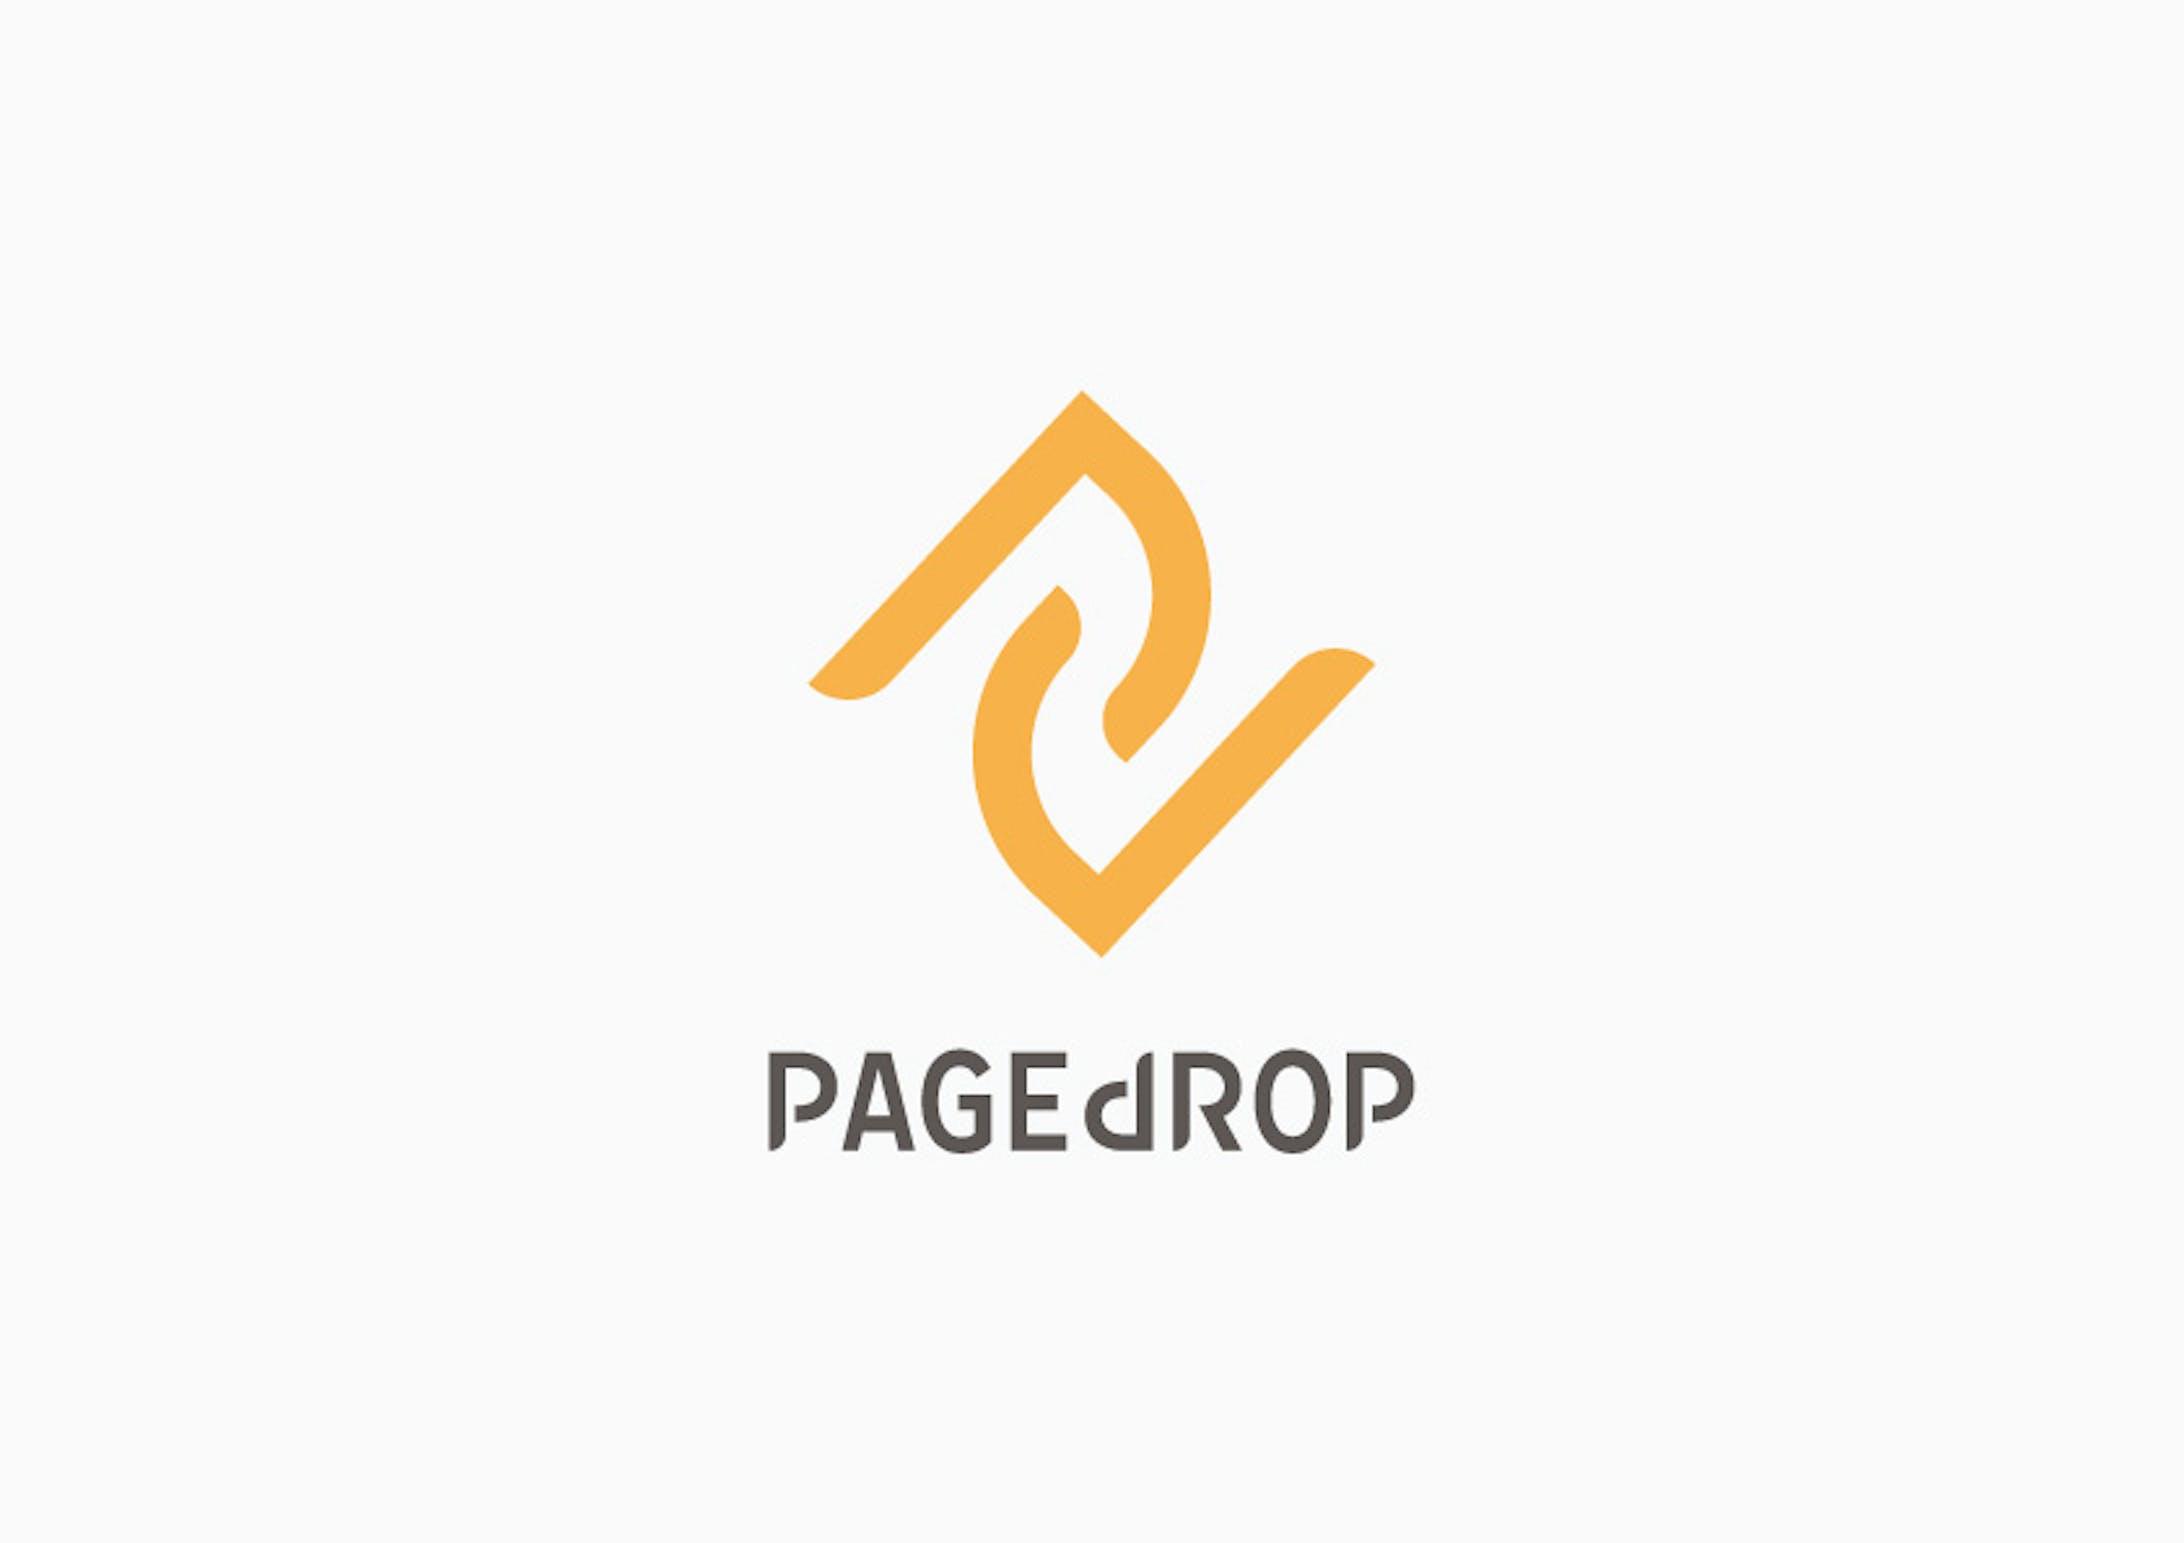 pagedrop-1